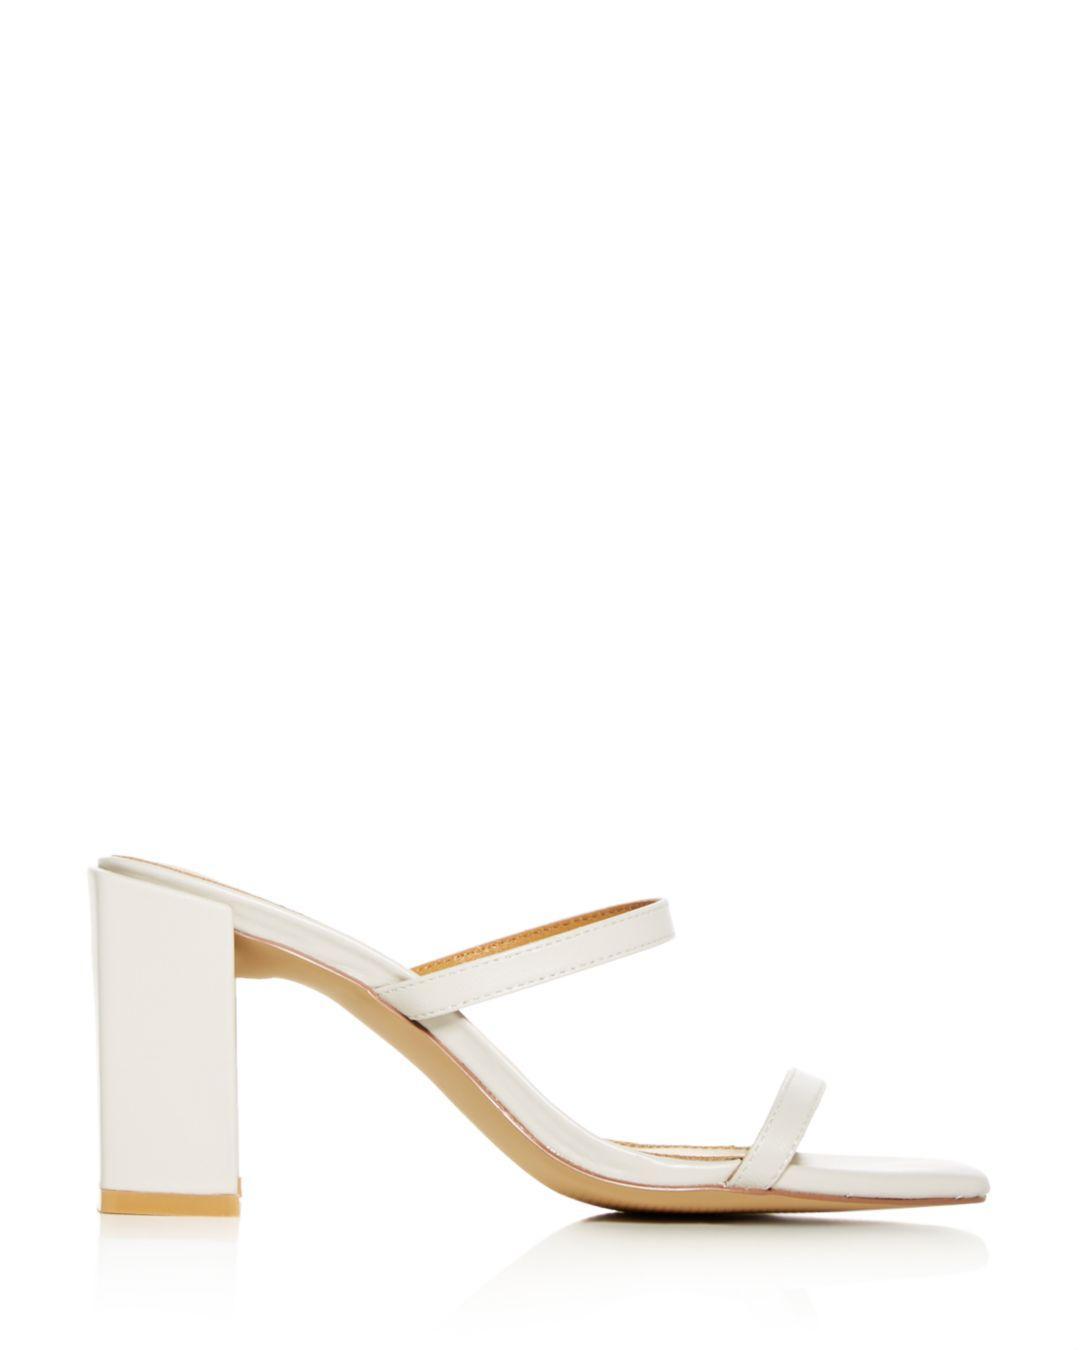 5c0b4722fcc Jaggar Women s Square Block-heel Slide Sandals in Natural - Lyst